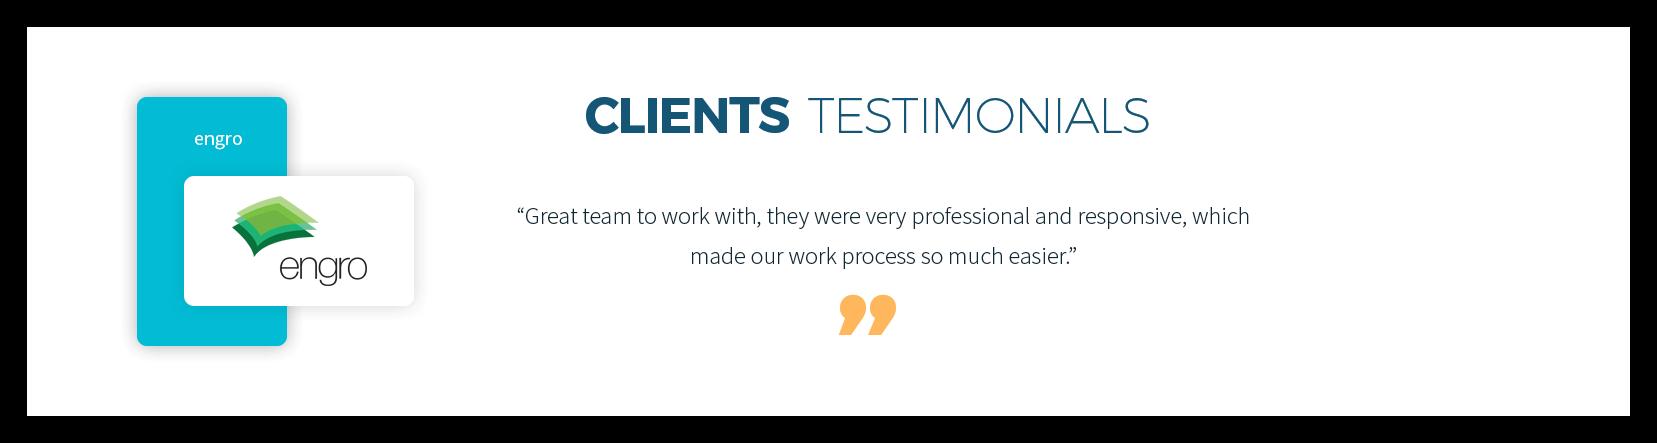 Client Testimonials2